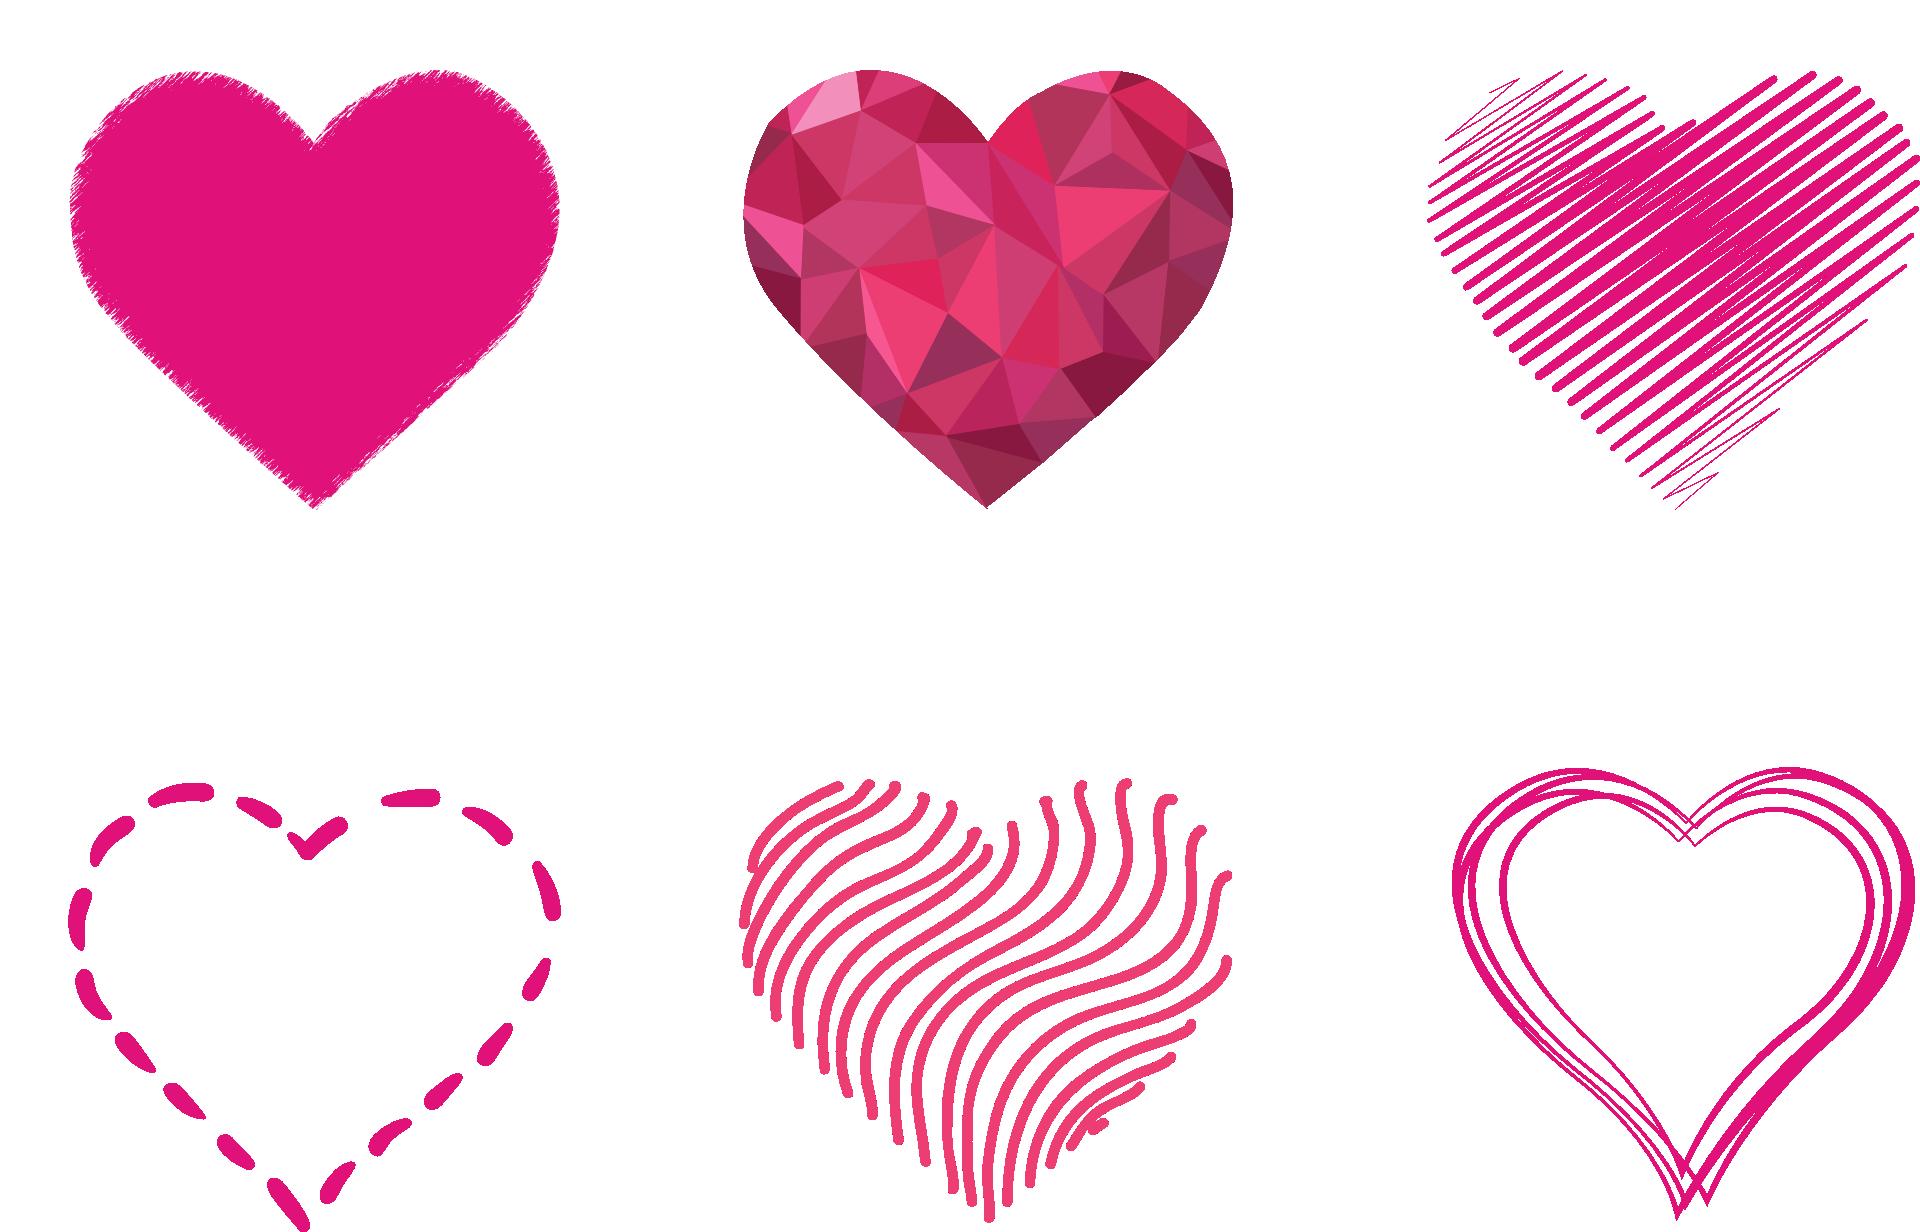 Pink Art Hearts PNG Image - PurePNG | Free transparent CC0